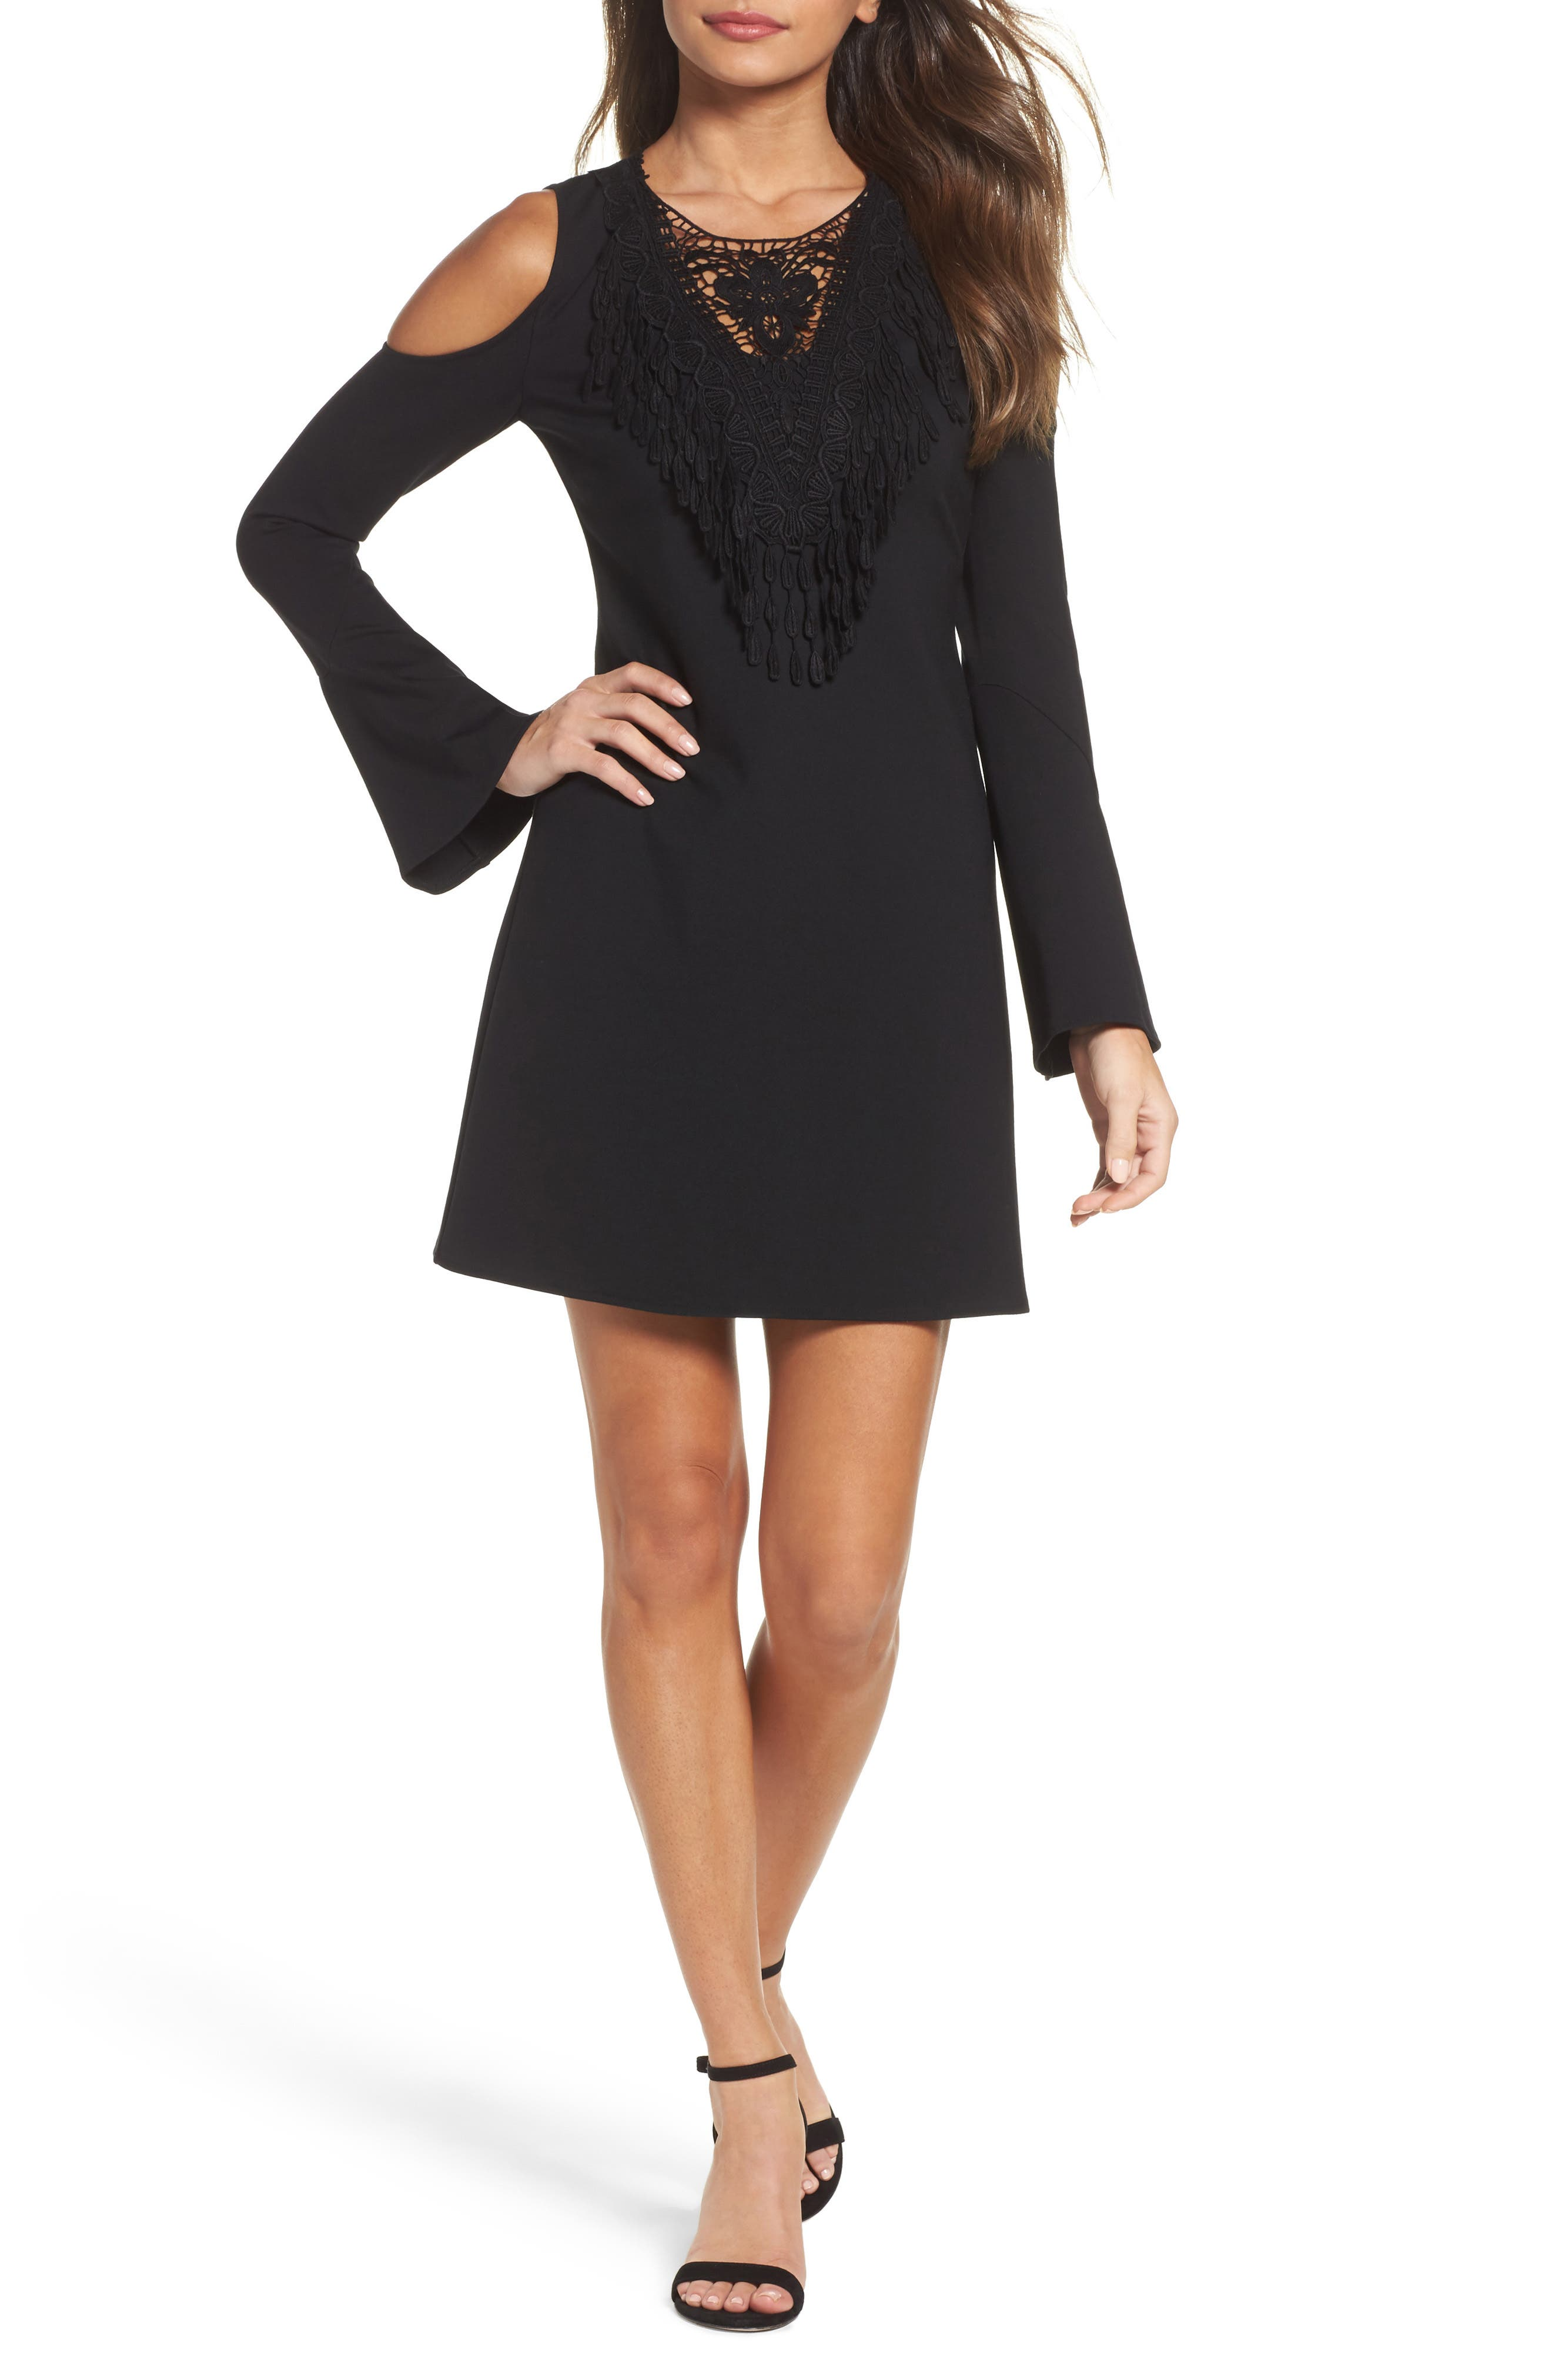 Main Image - Kobi Halperin Brie Double Knit Shift Dress (Nordstrom Exclusive)